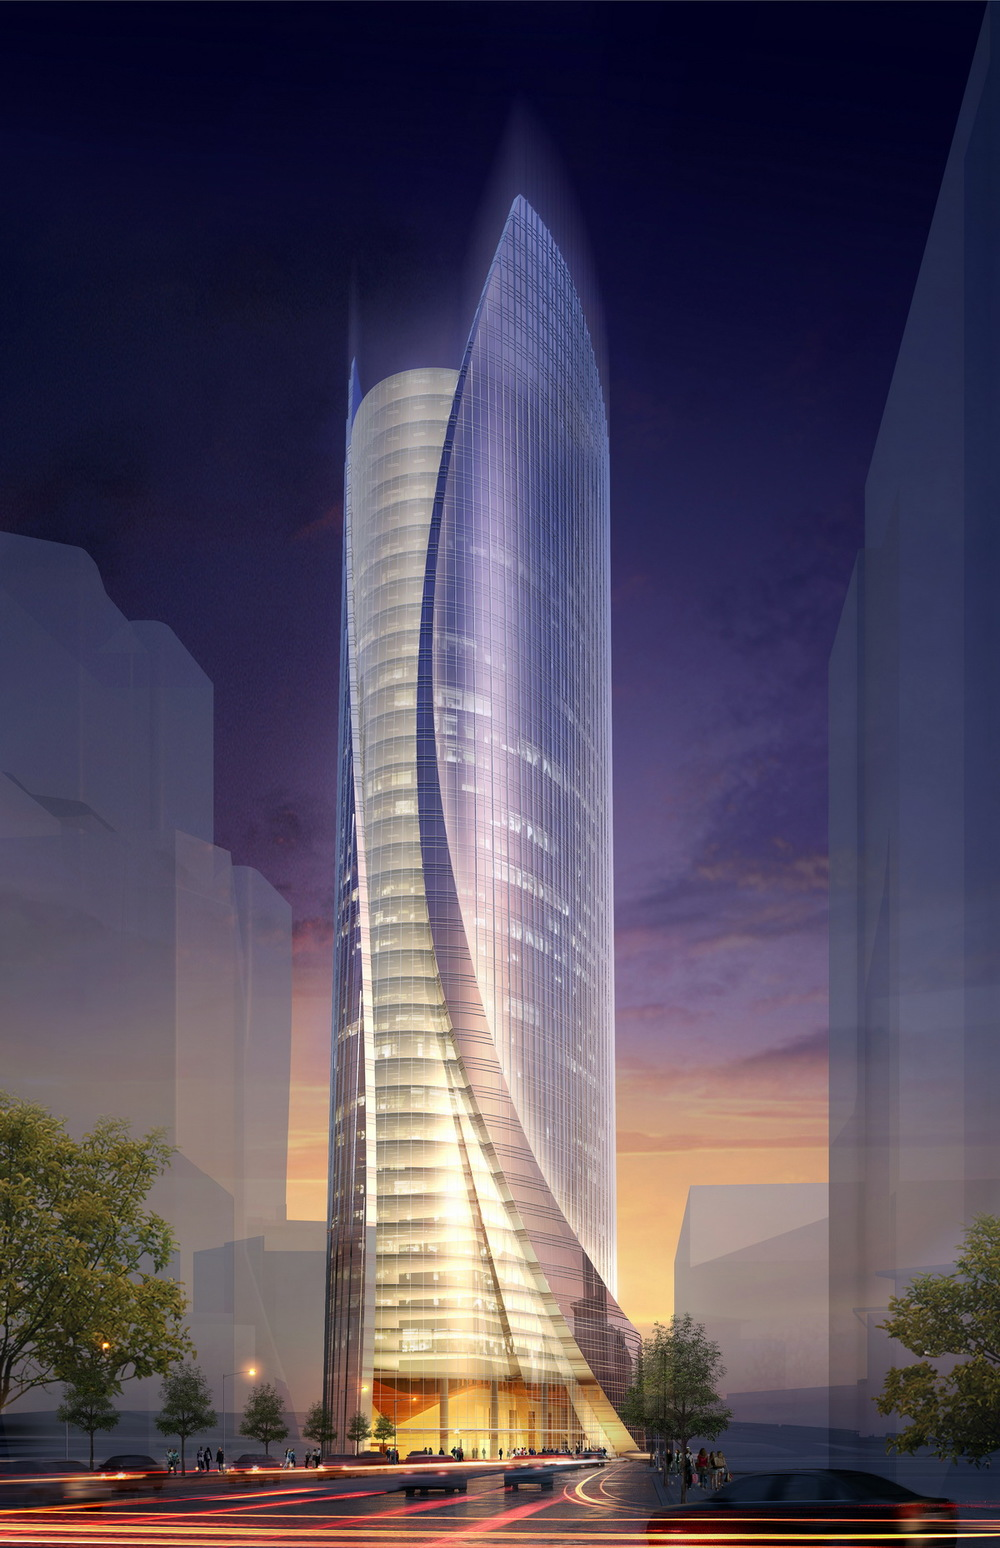 WP-B2: Office Tower Dusk